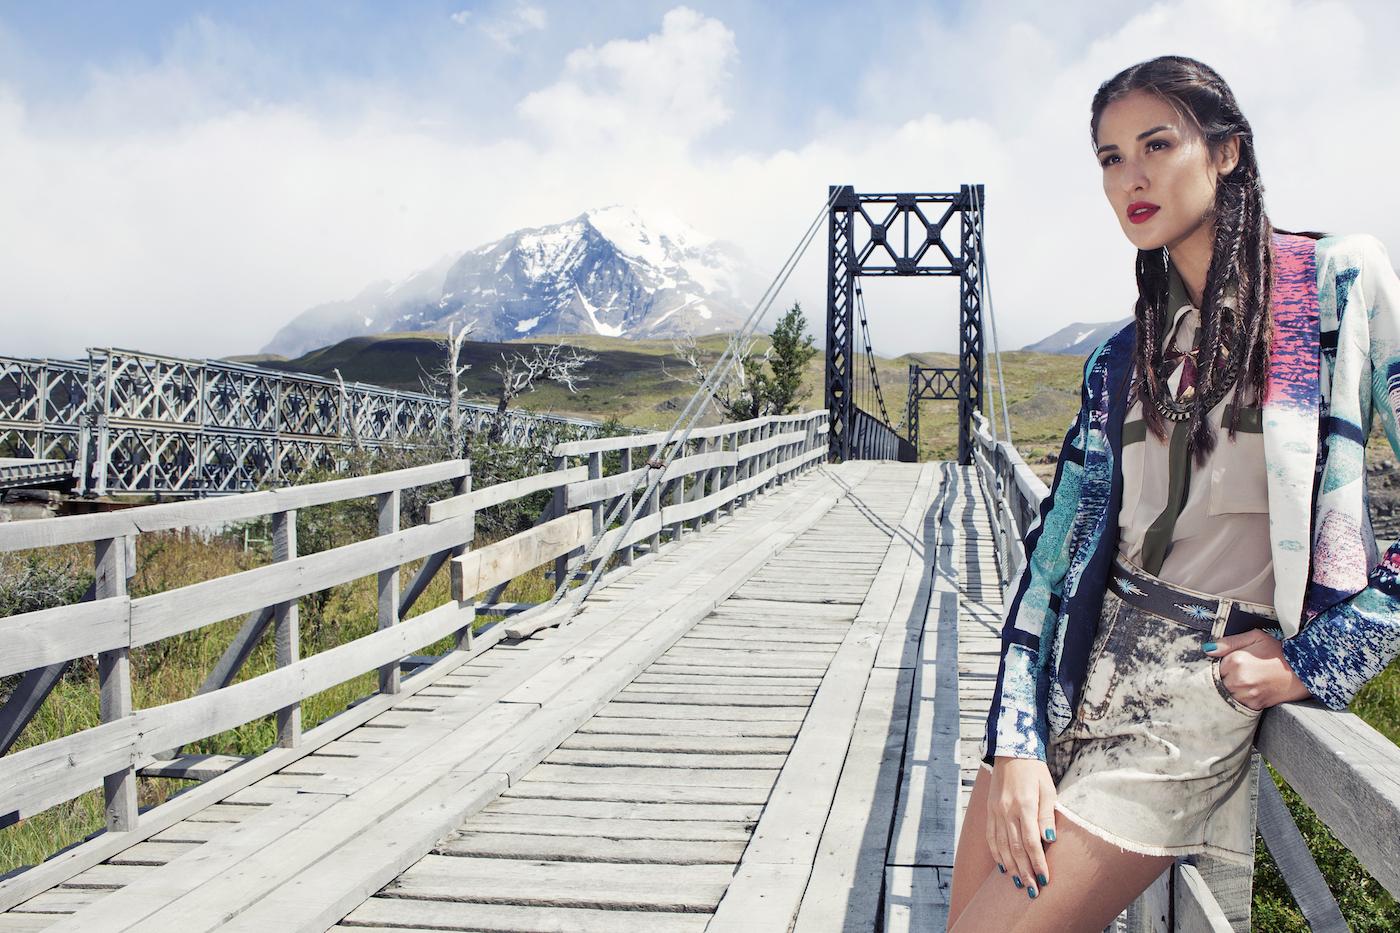 Karamello Torres Del Paine_2155lado.jpg